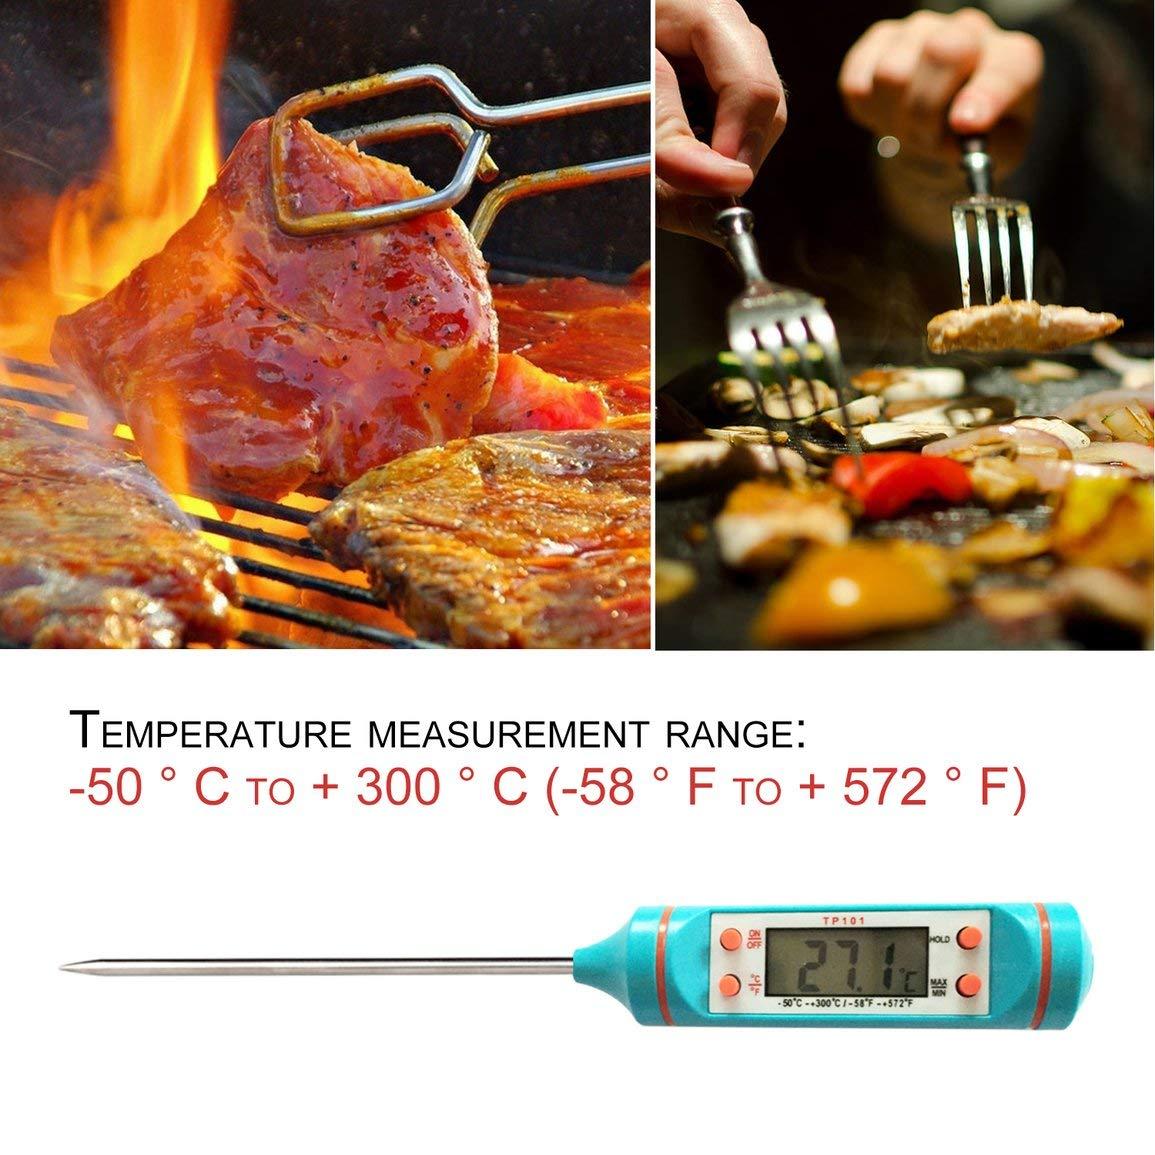 TP101 Cocinar Pantalla LCD de la Carne del alimento Term/ómetro Digital de Acero Inoxidable Sonda de Cocina Horno Barbacoa l/íquidos Suministros de Cocina